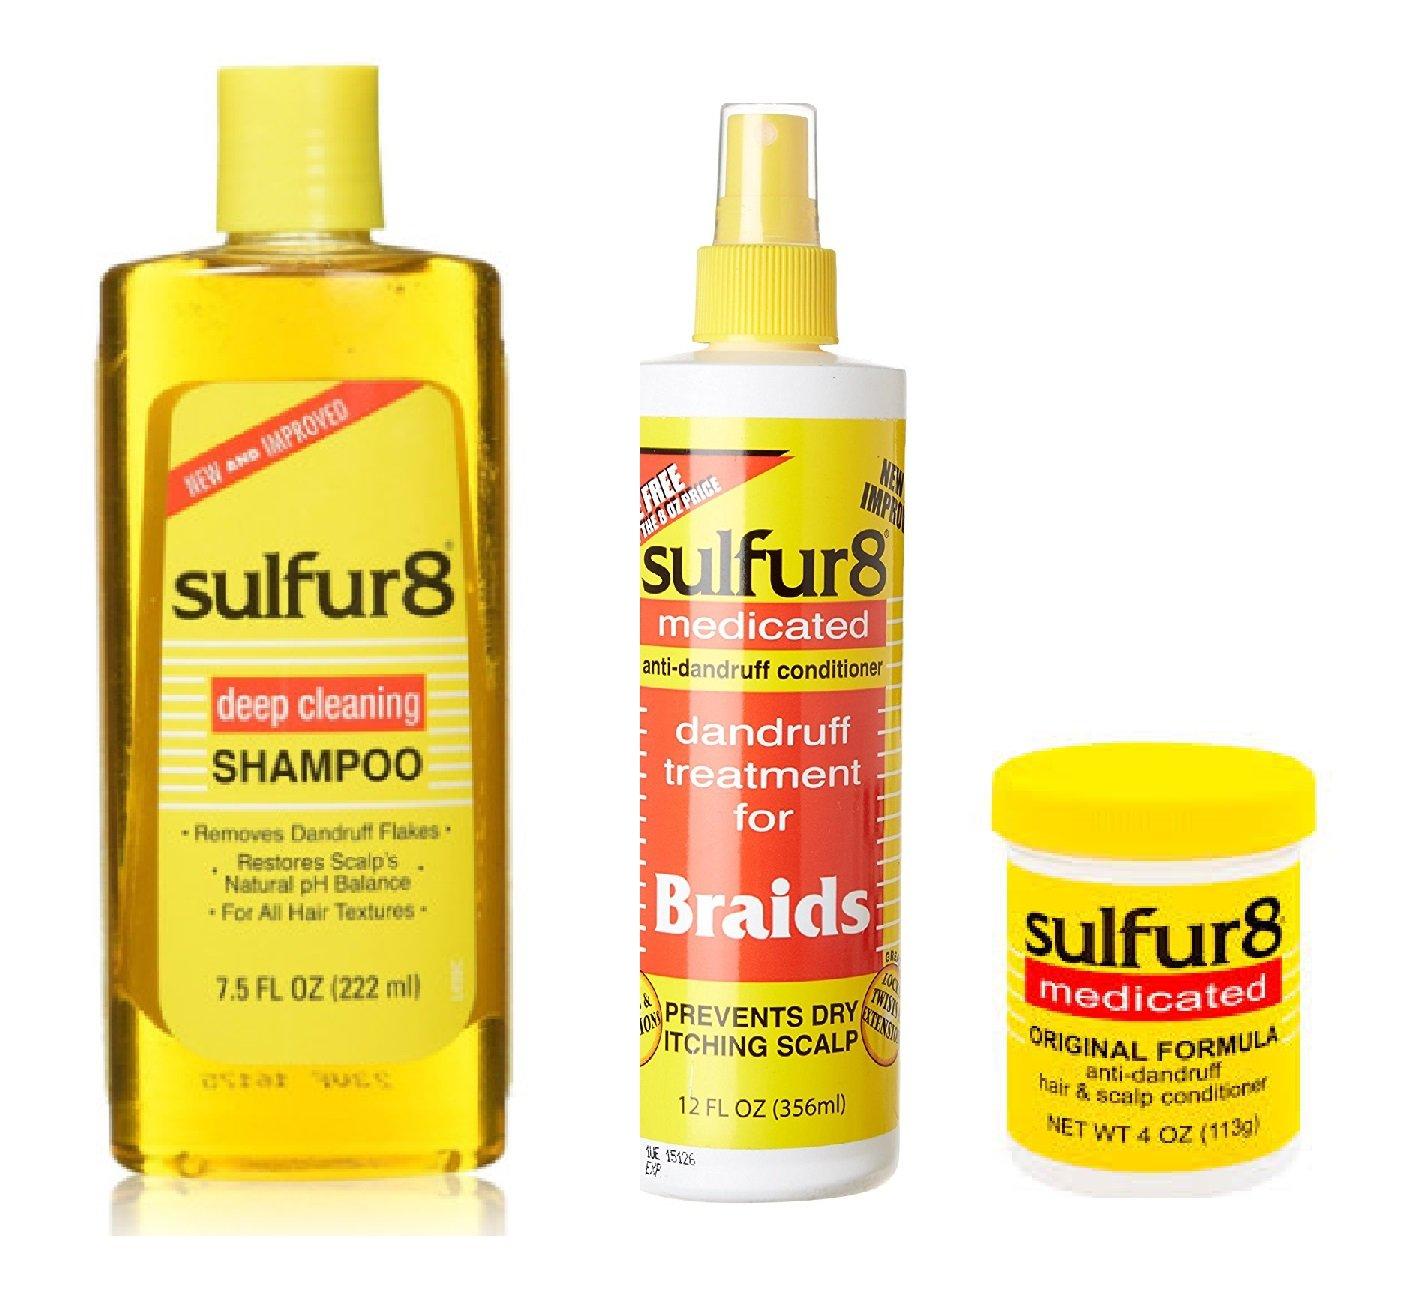 Sulfur 8 Dandruff Treatment (COMBO)